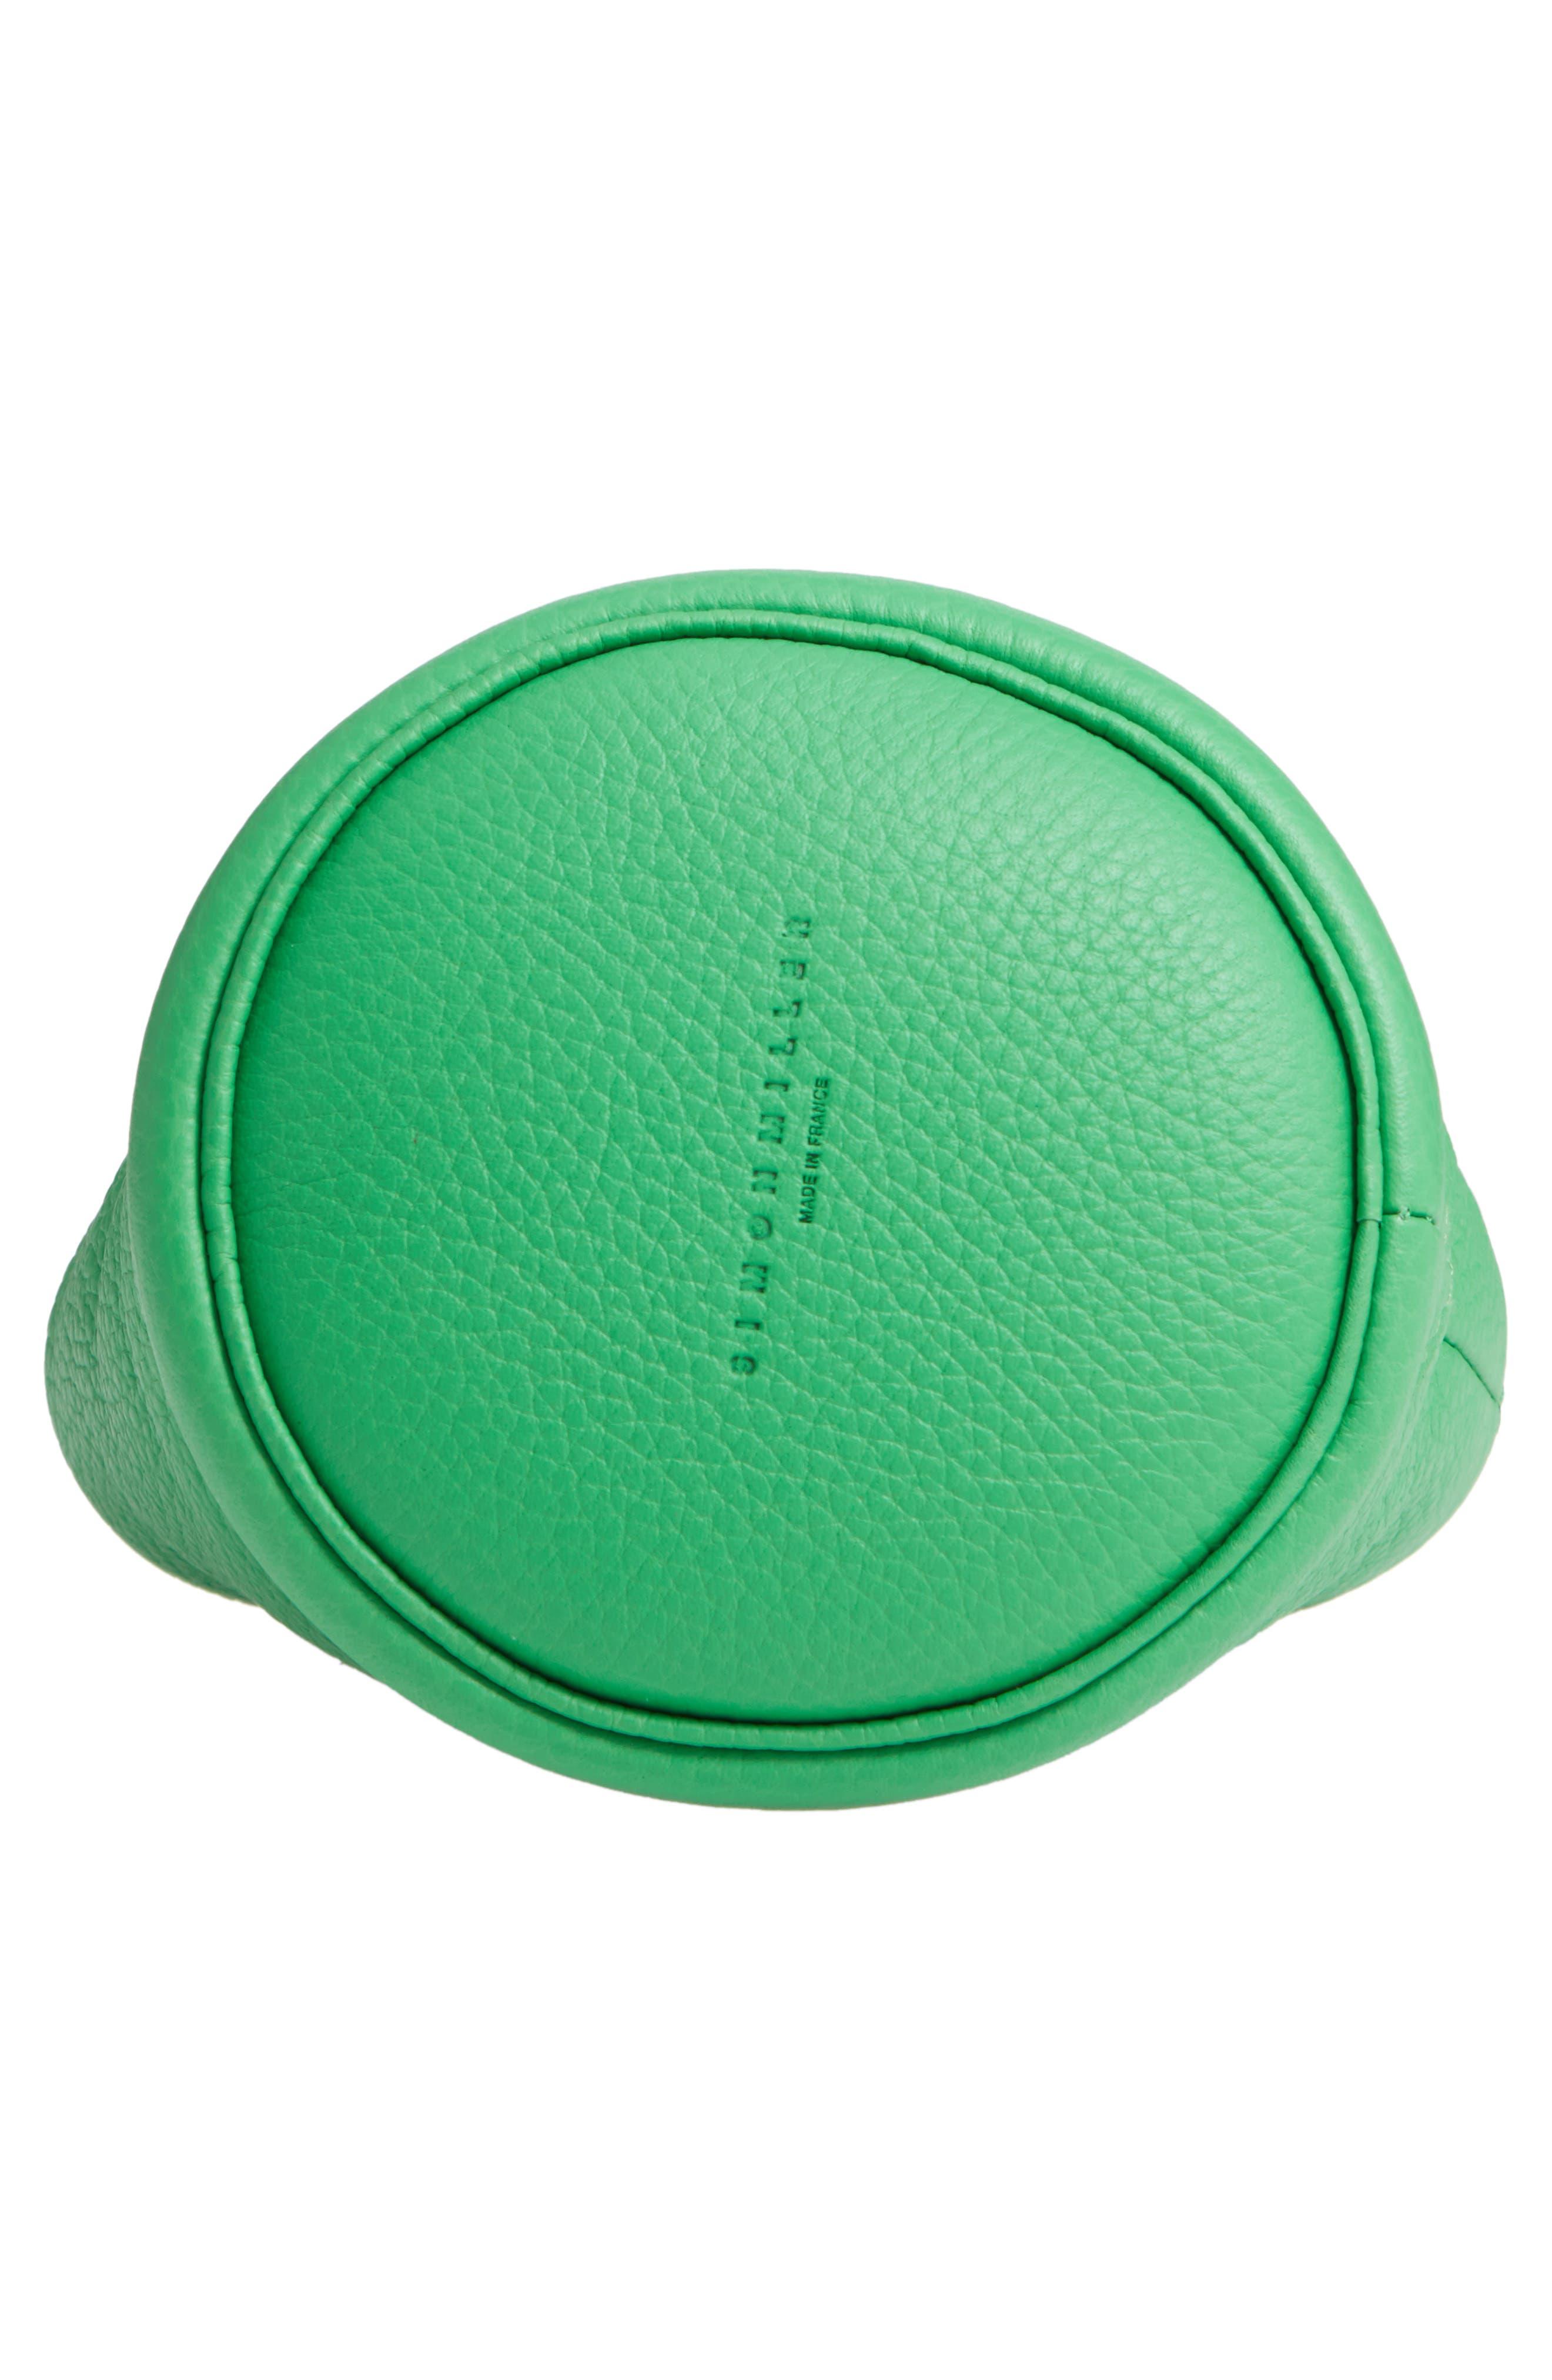 SIMON MILLER, Bonsai 15 Calfskin Leather Bucket Bag, Alternate thumbnail 6, color, NEON GREEN